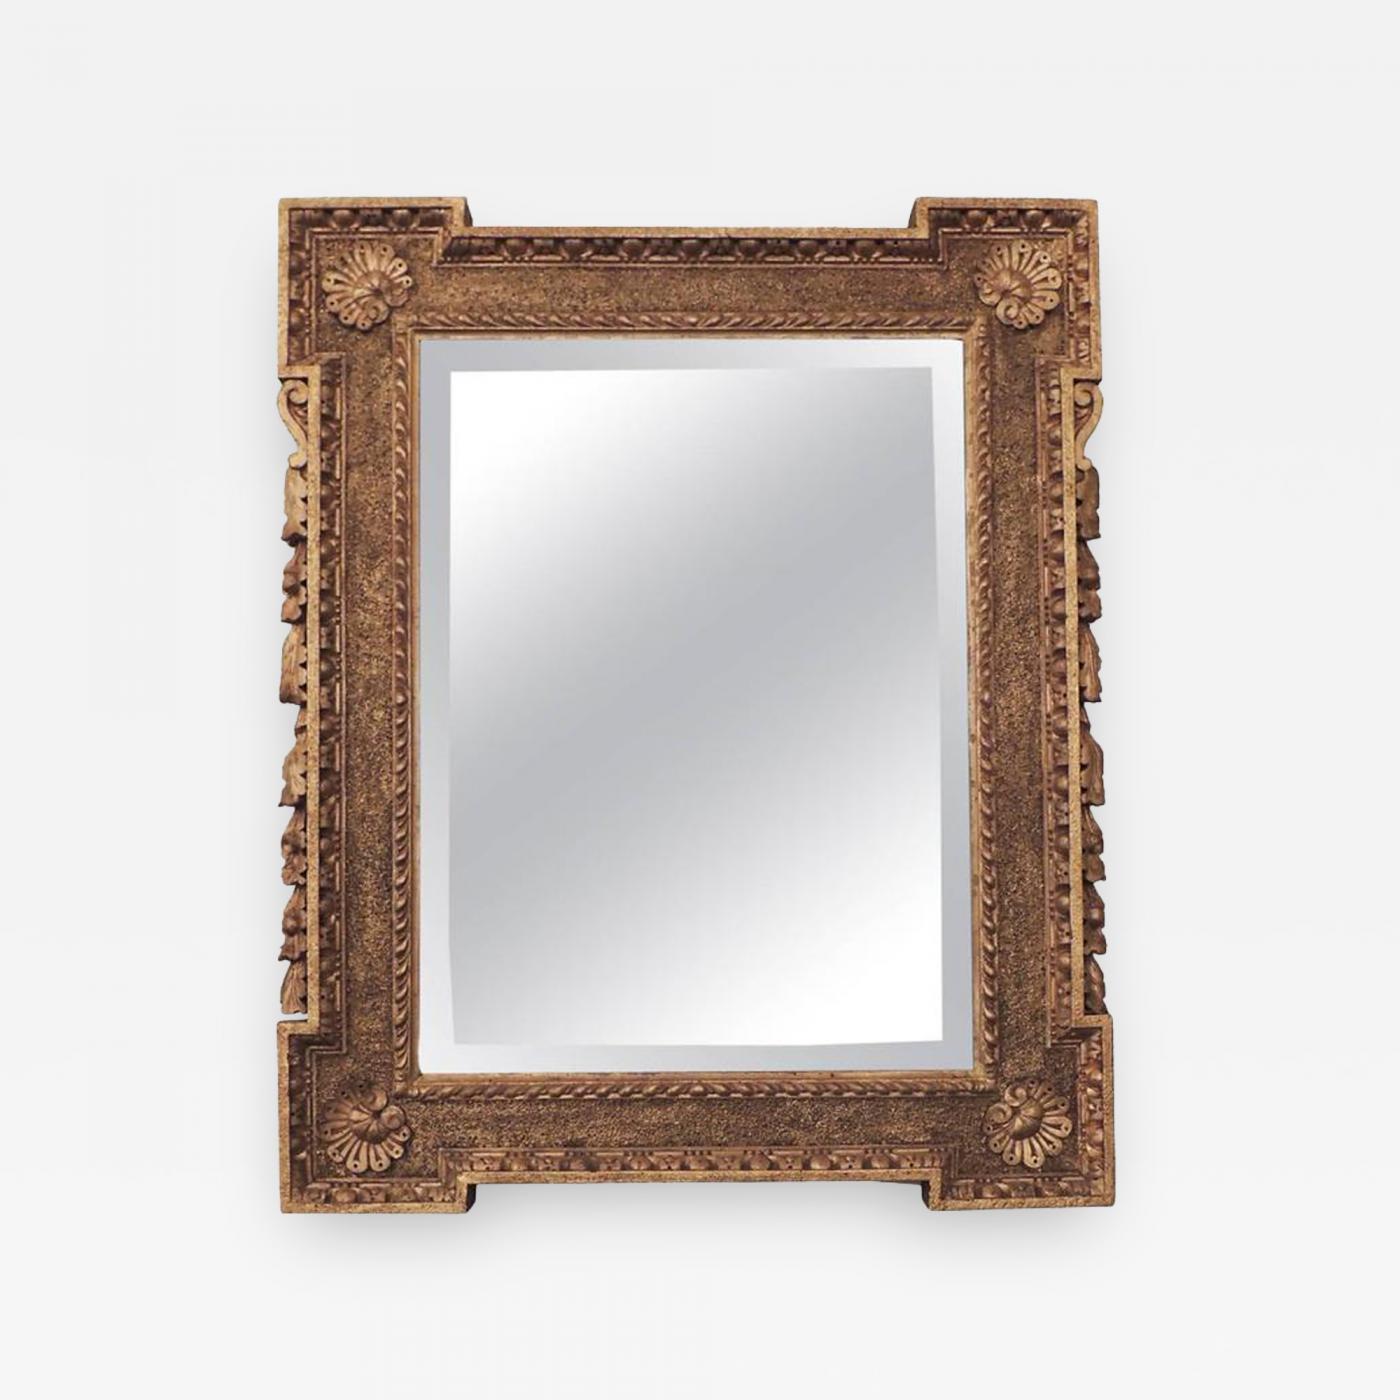 William Kent - Early 18th C English Palladian Gilt Frame Mirror ...